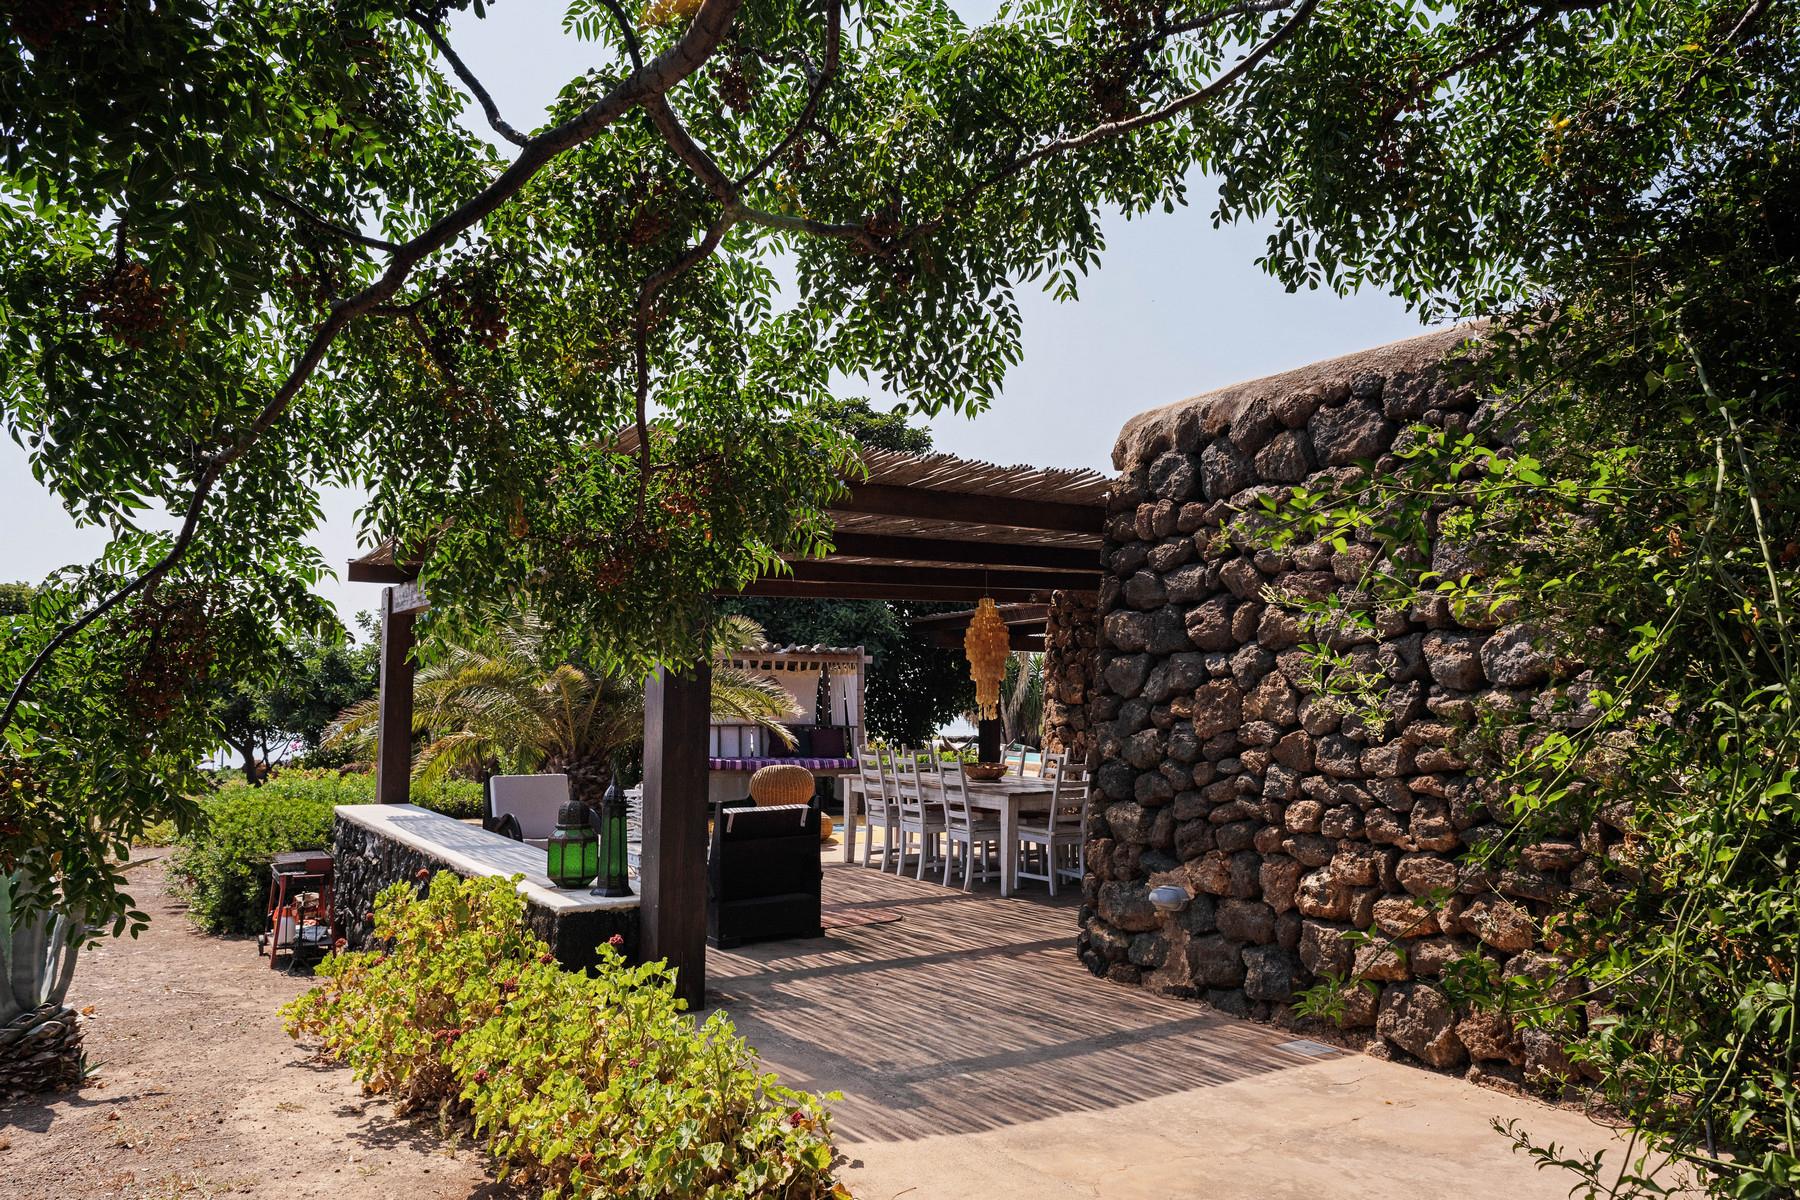 Villa in Vendita a Pantelleria: 5 locali, 82 mq - Foto 3